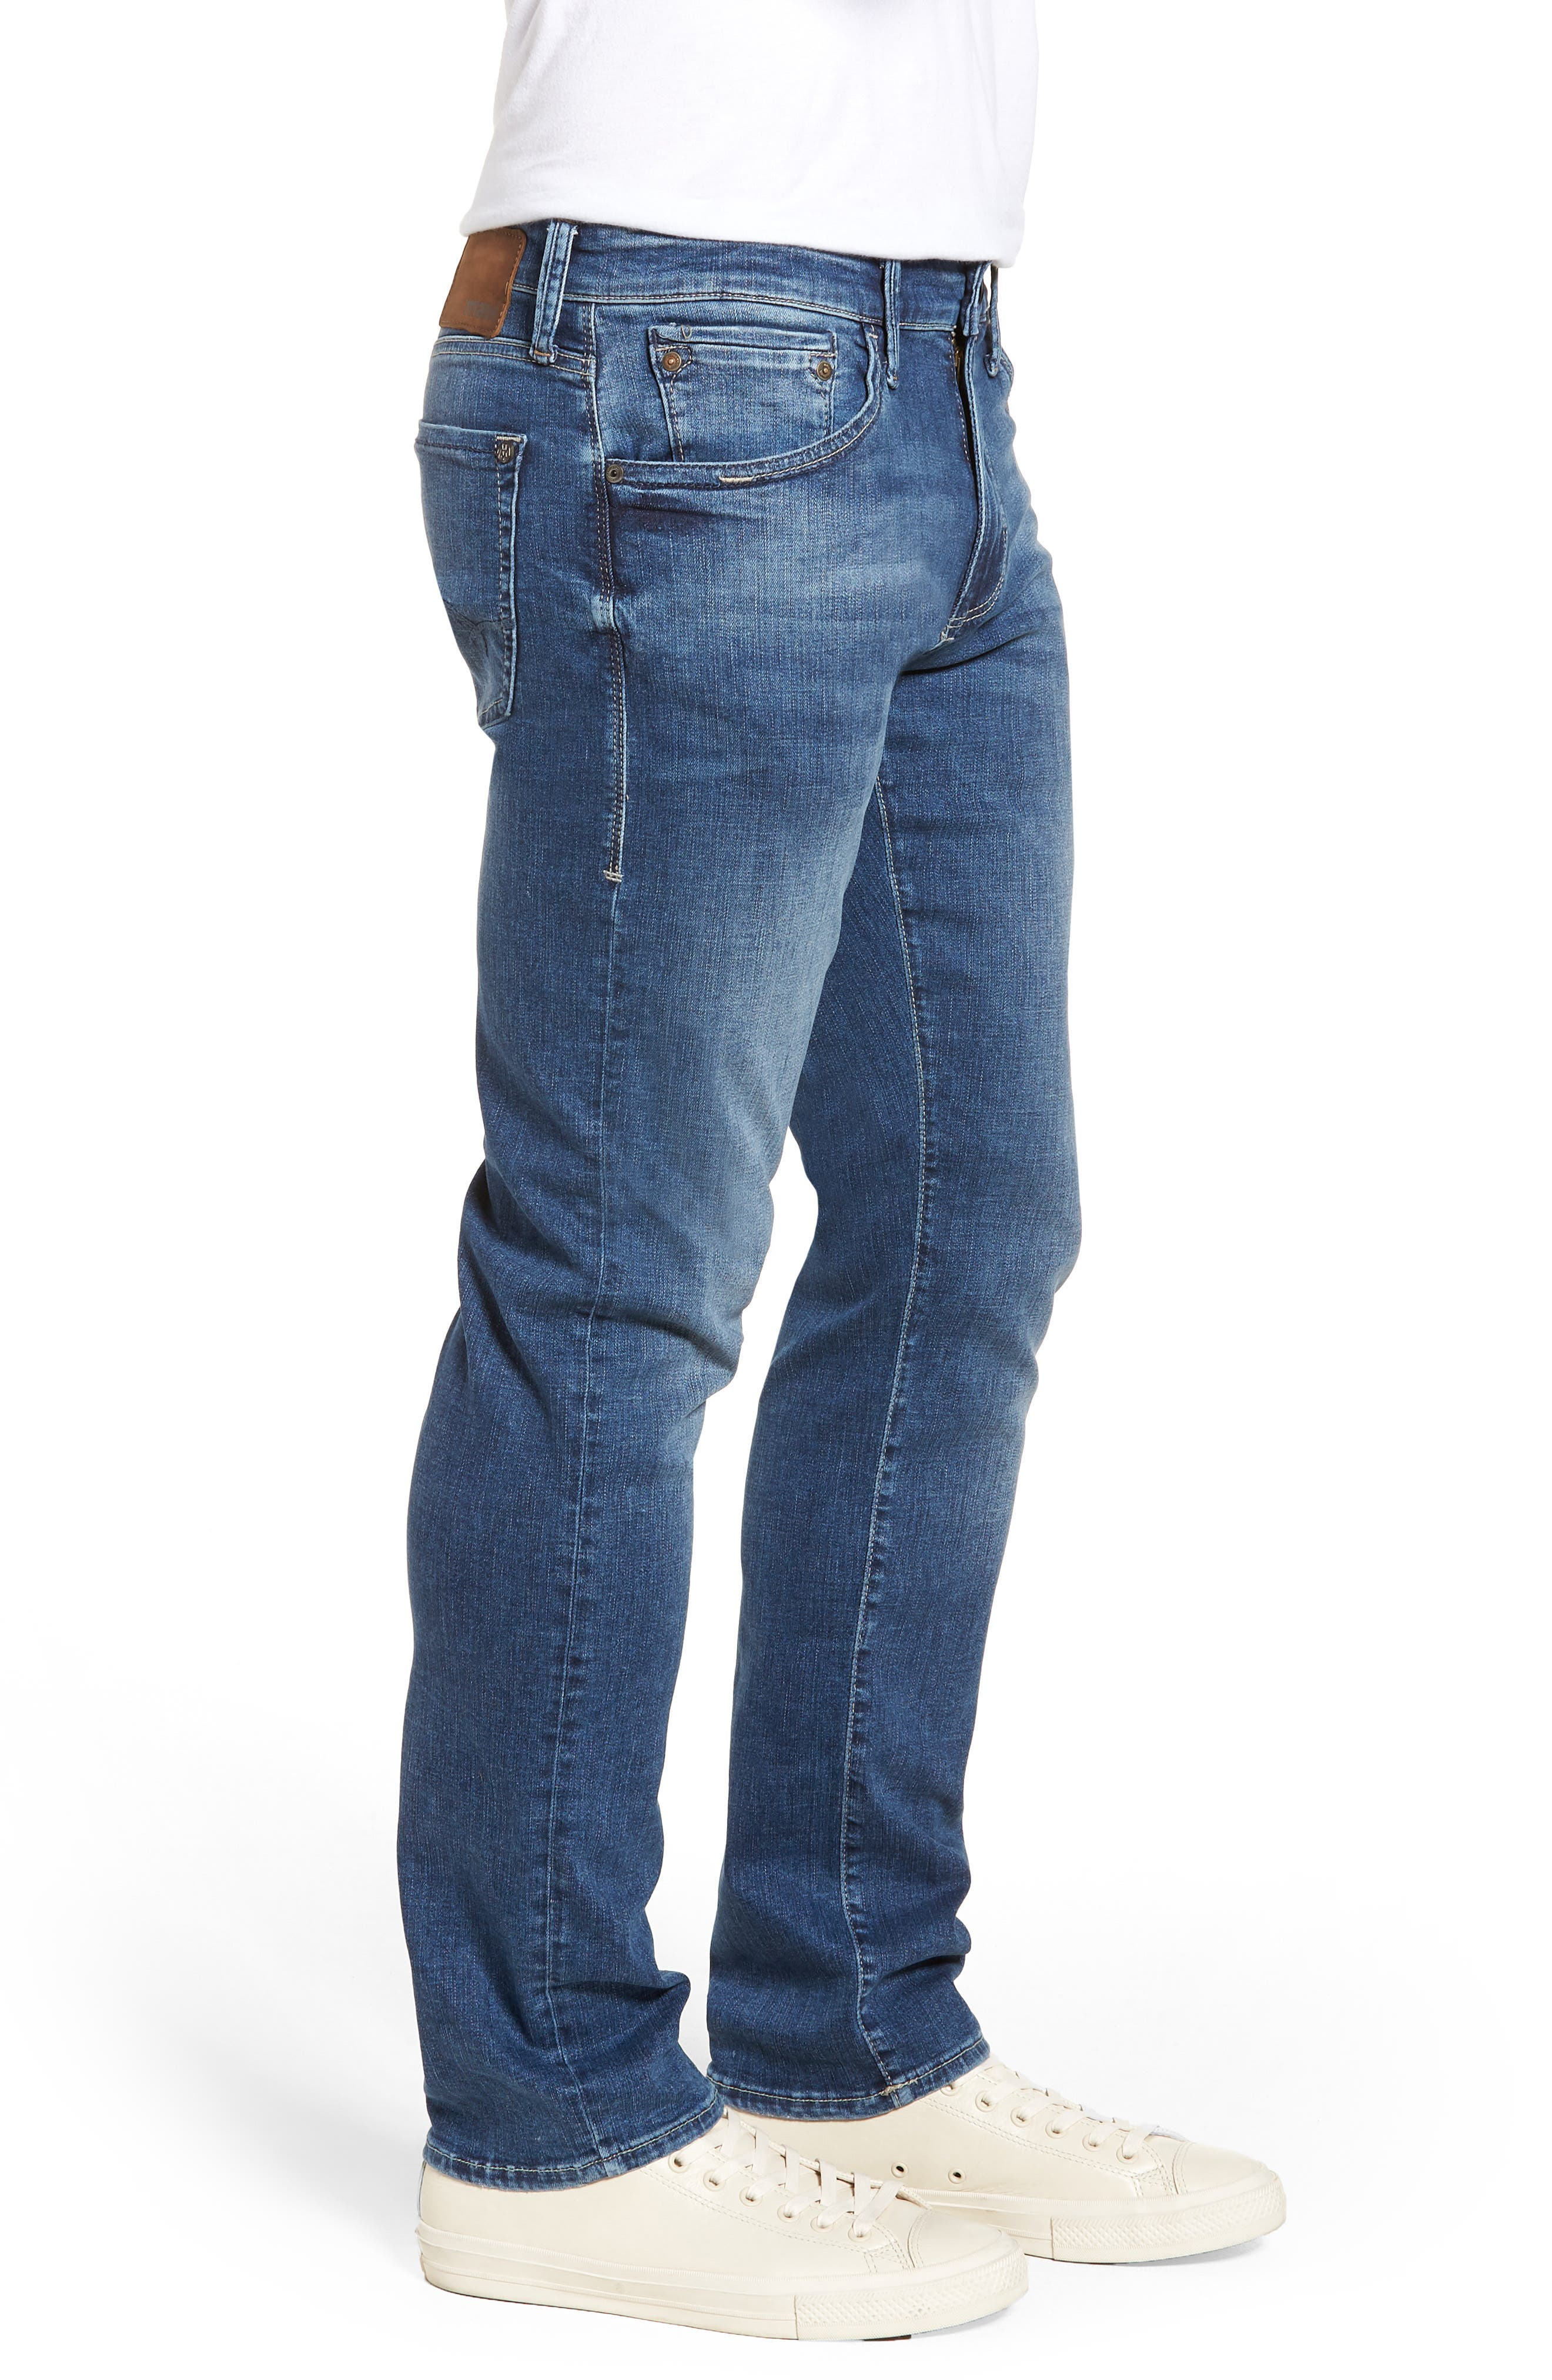 Zach Straight Leg Jeans,                             Alternate thumbnail 3, color,                             Indigo Cashmere